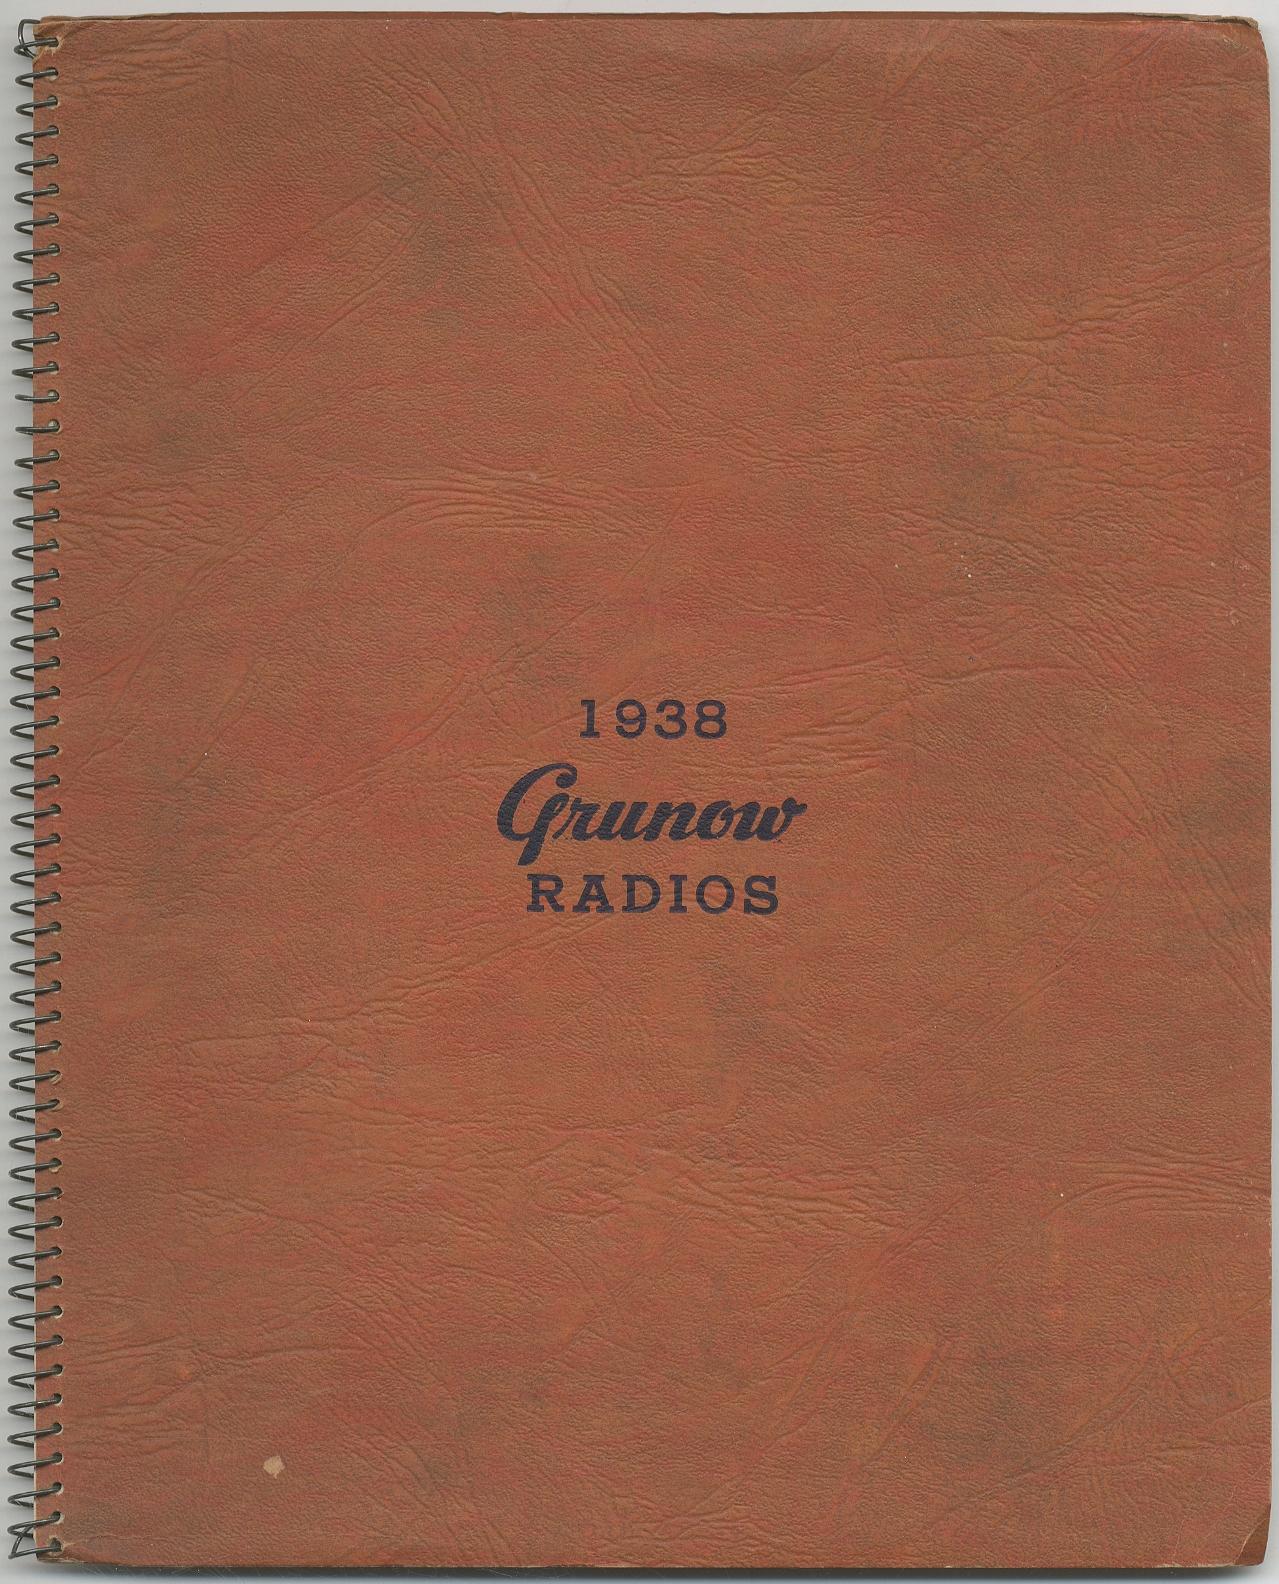 [Catalog]: 1938 Grunow Radios Fine